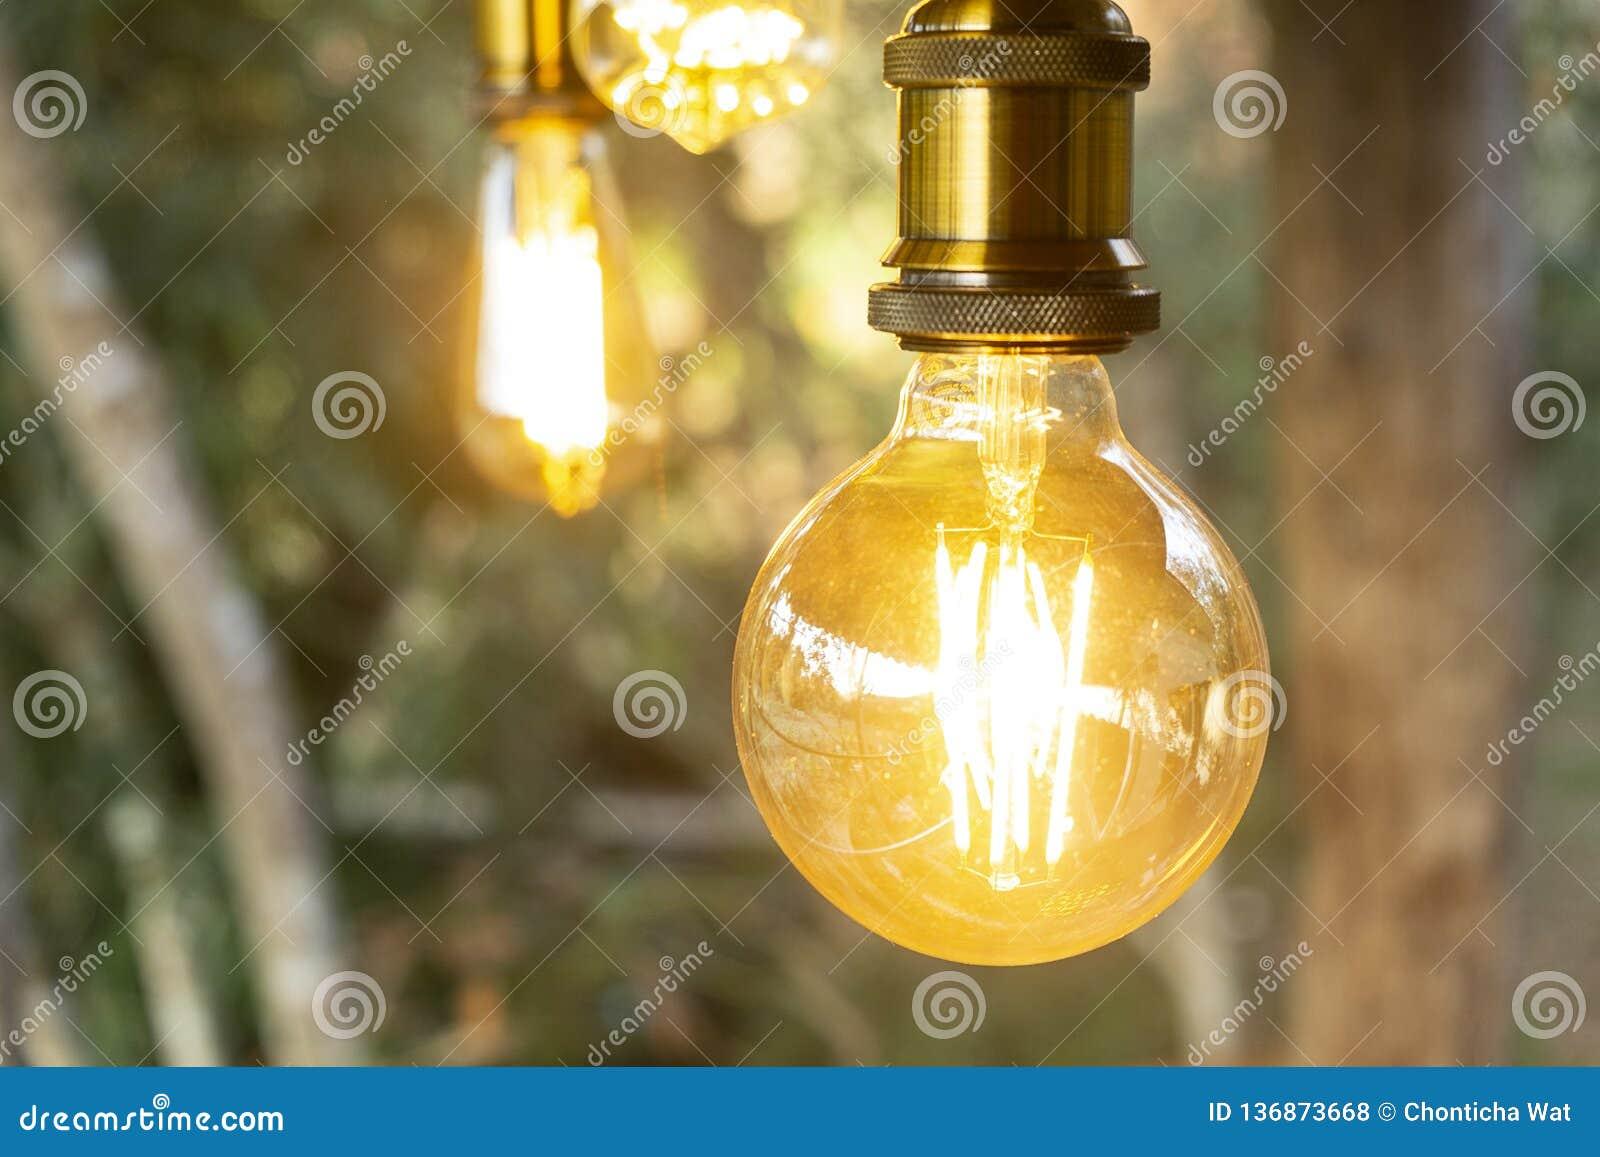 Retro Lampen Led : Retro incandescent led electric lamp on blur background vintage